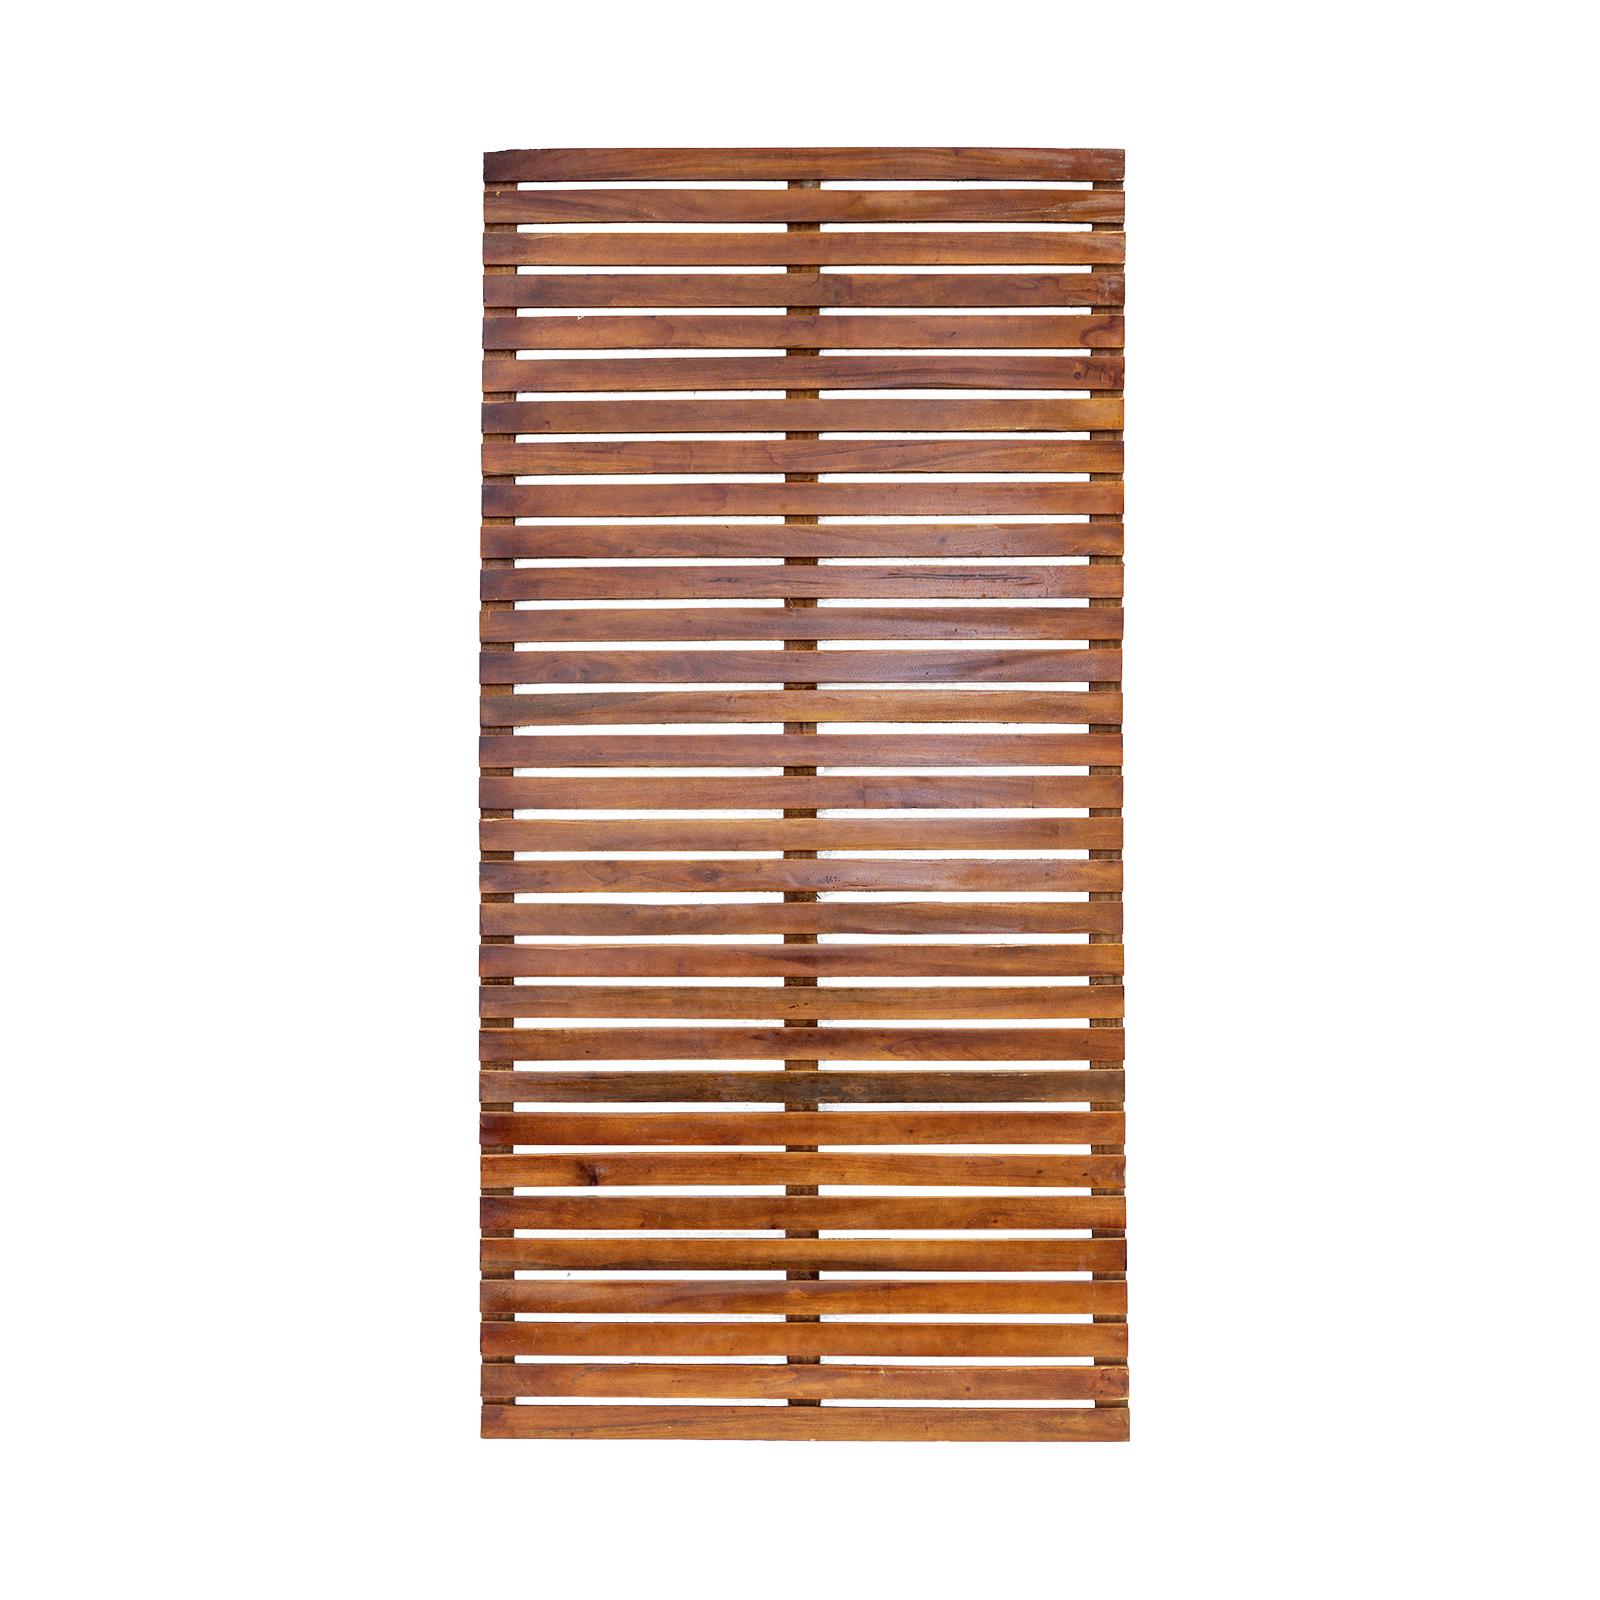 Lattice Makers 1800 x 900mm Hardwood Slat Screen